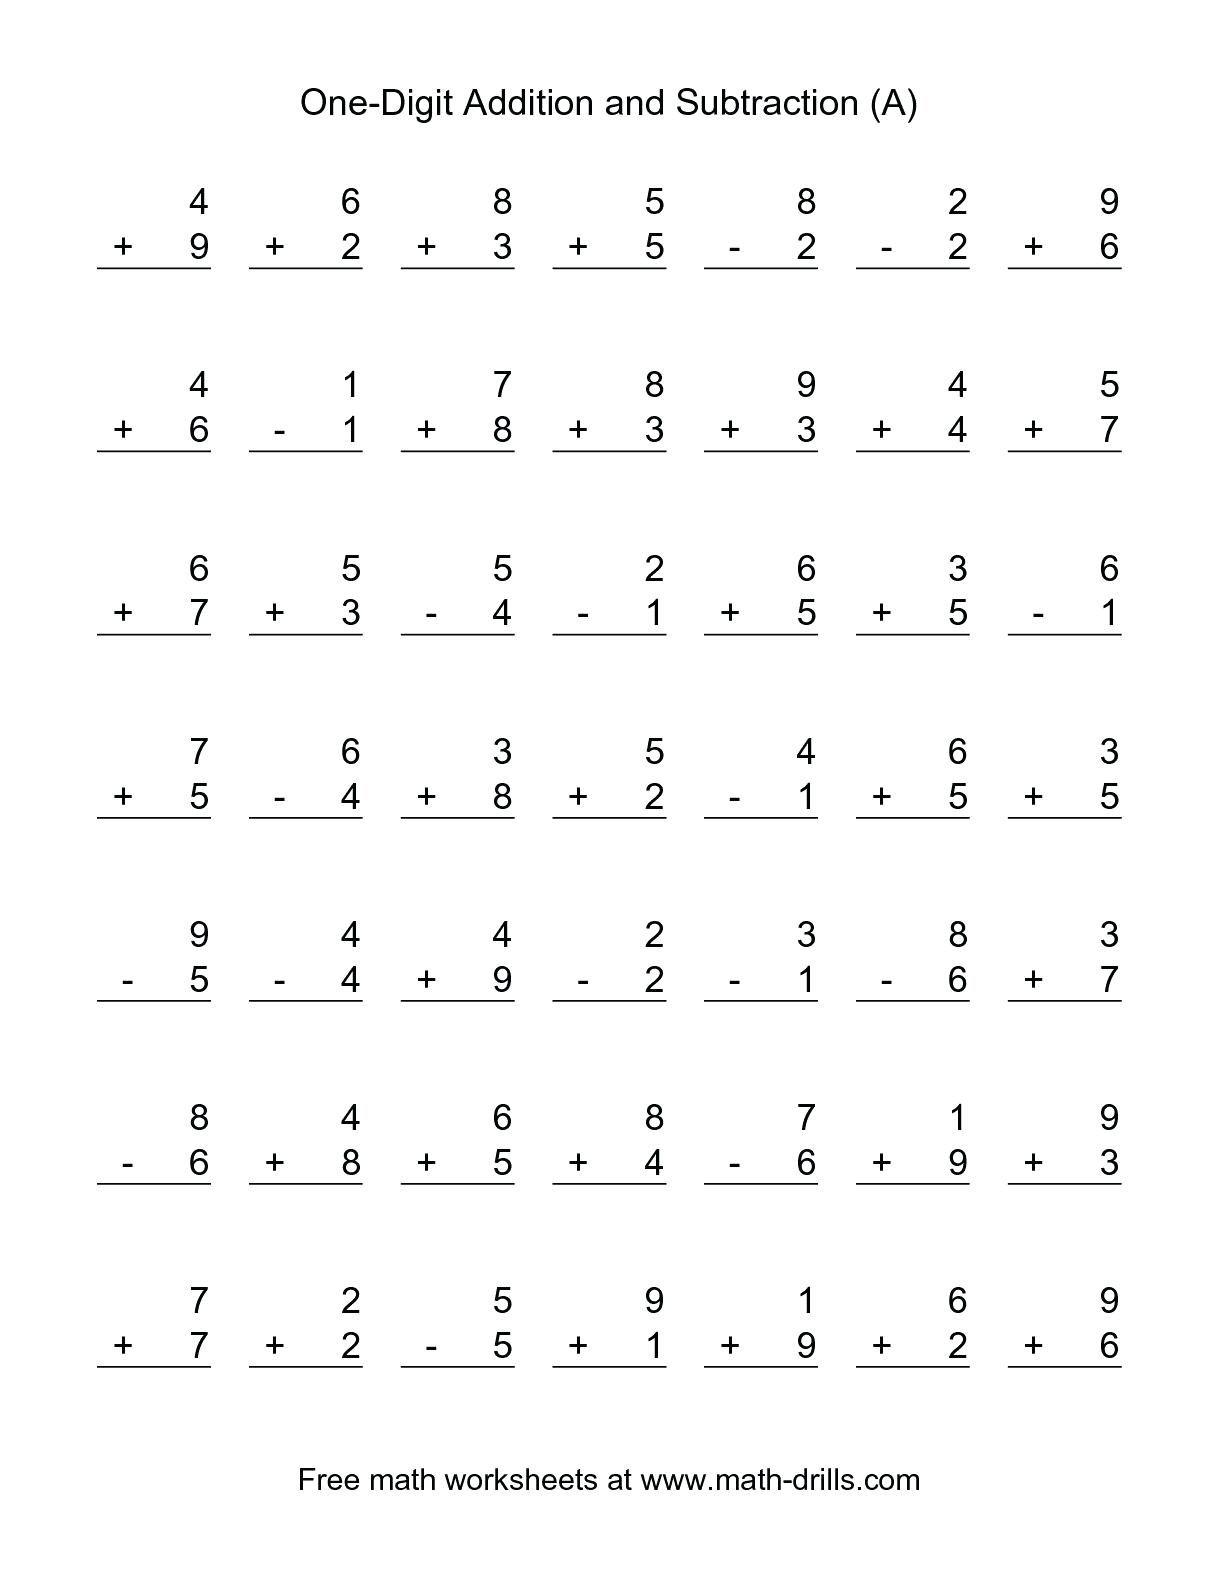 39 Simple First Grade Math Worksheets For You Https Bacamajalah Com 39 Sim Basic Math Worksheets Addition And Subtraction Worksheets Subtraction Worksheets